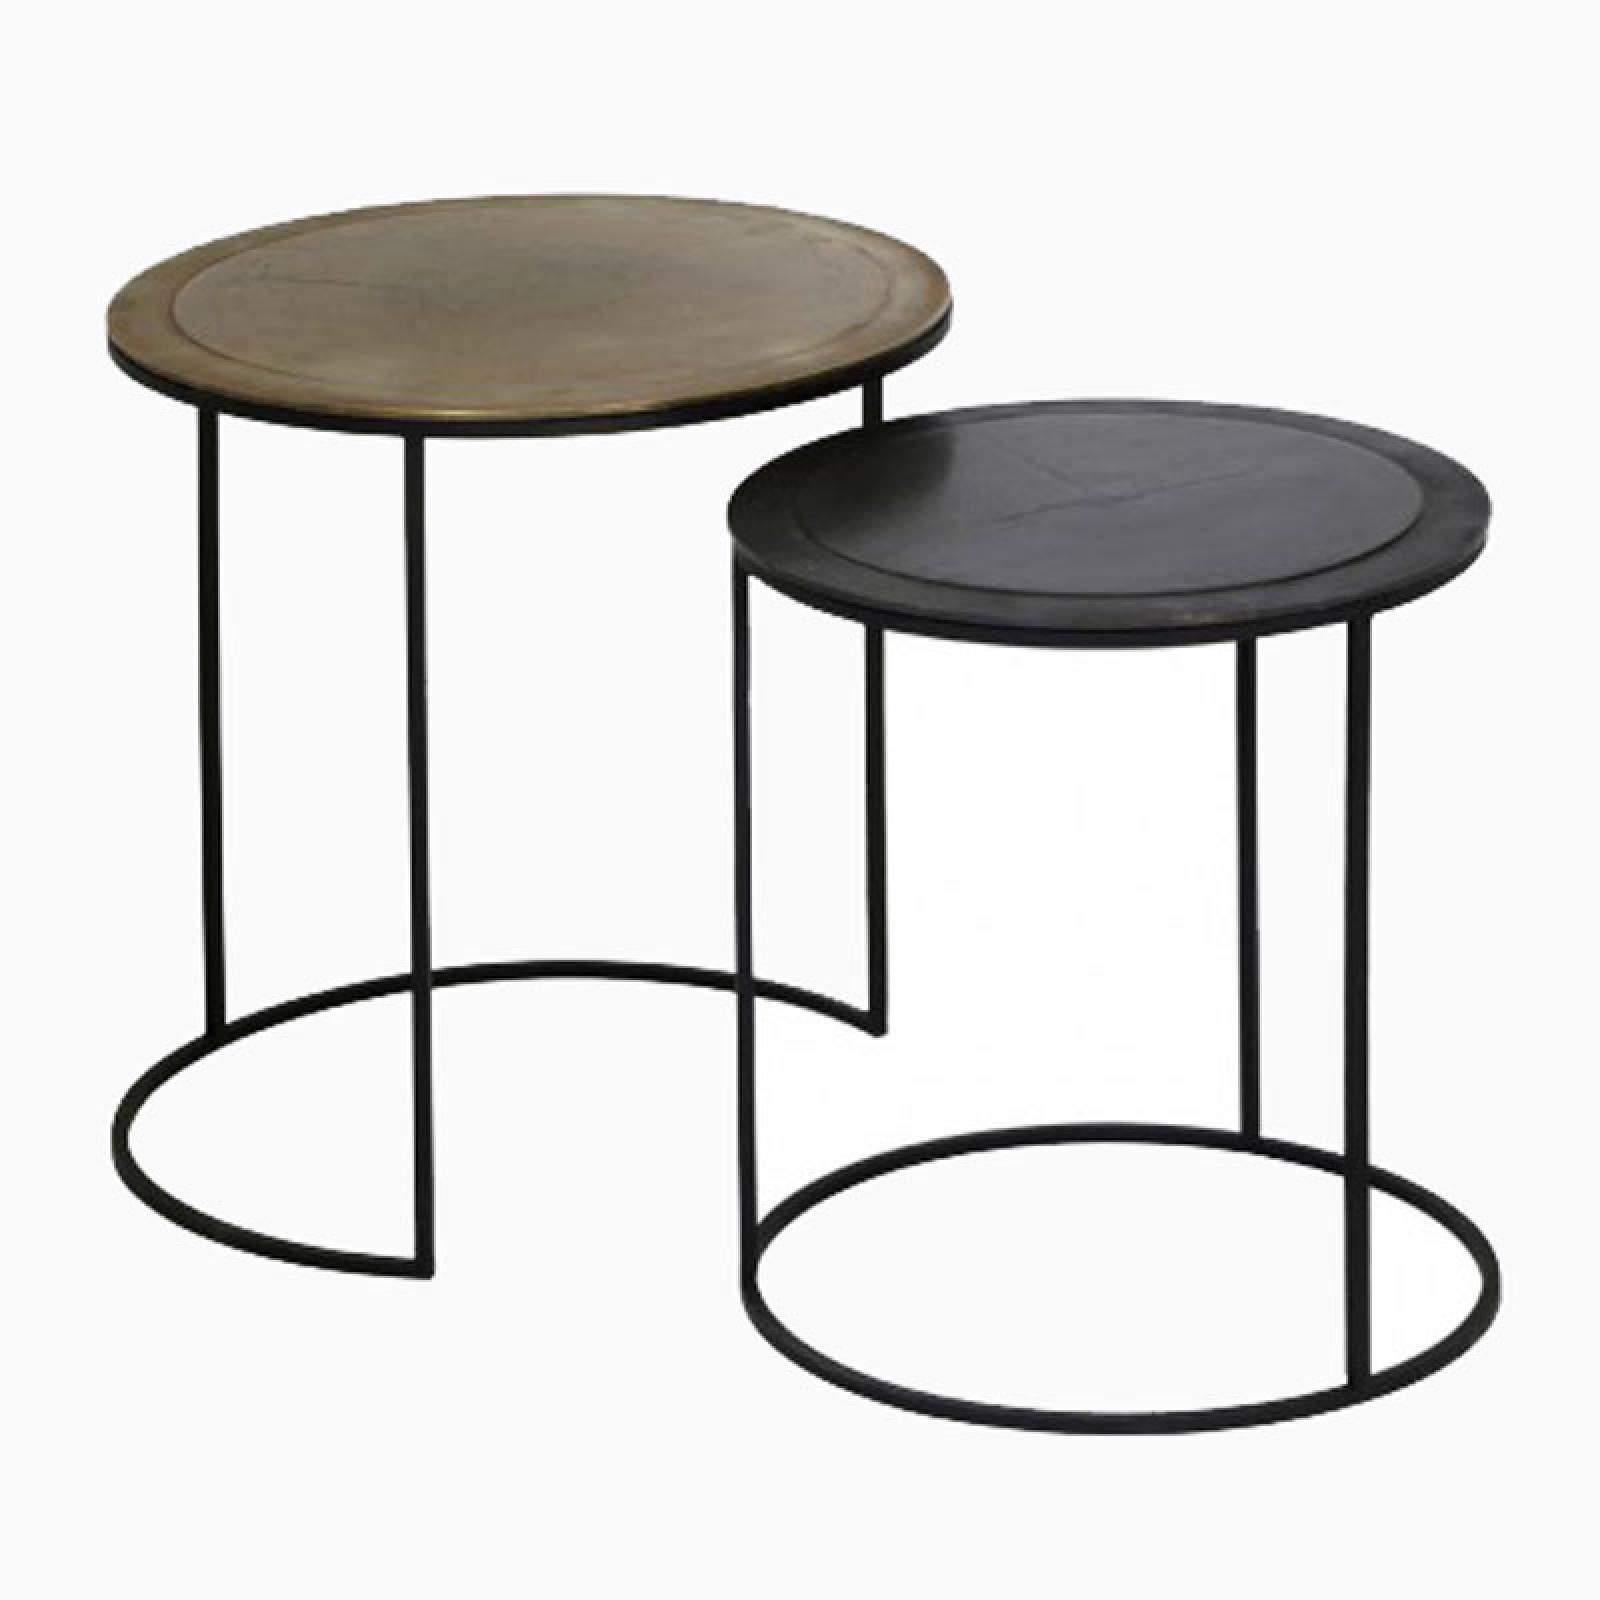 Calta Pair Of Circular Metal Side Tables thumbnails